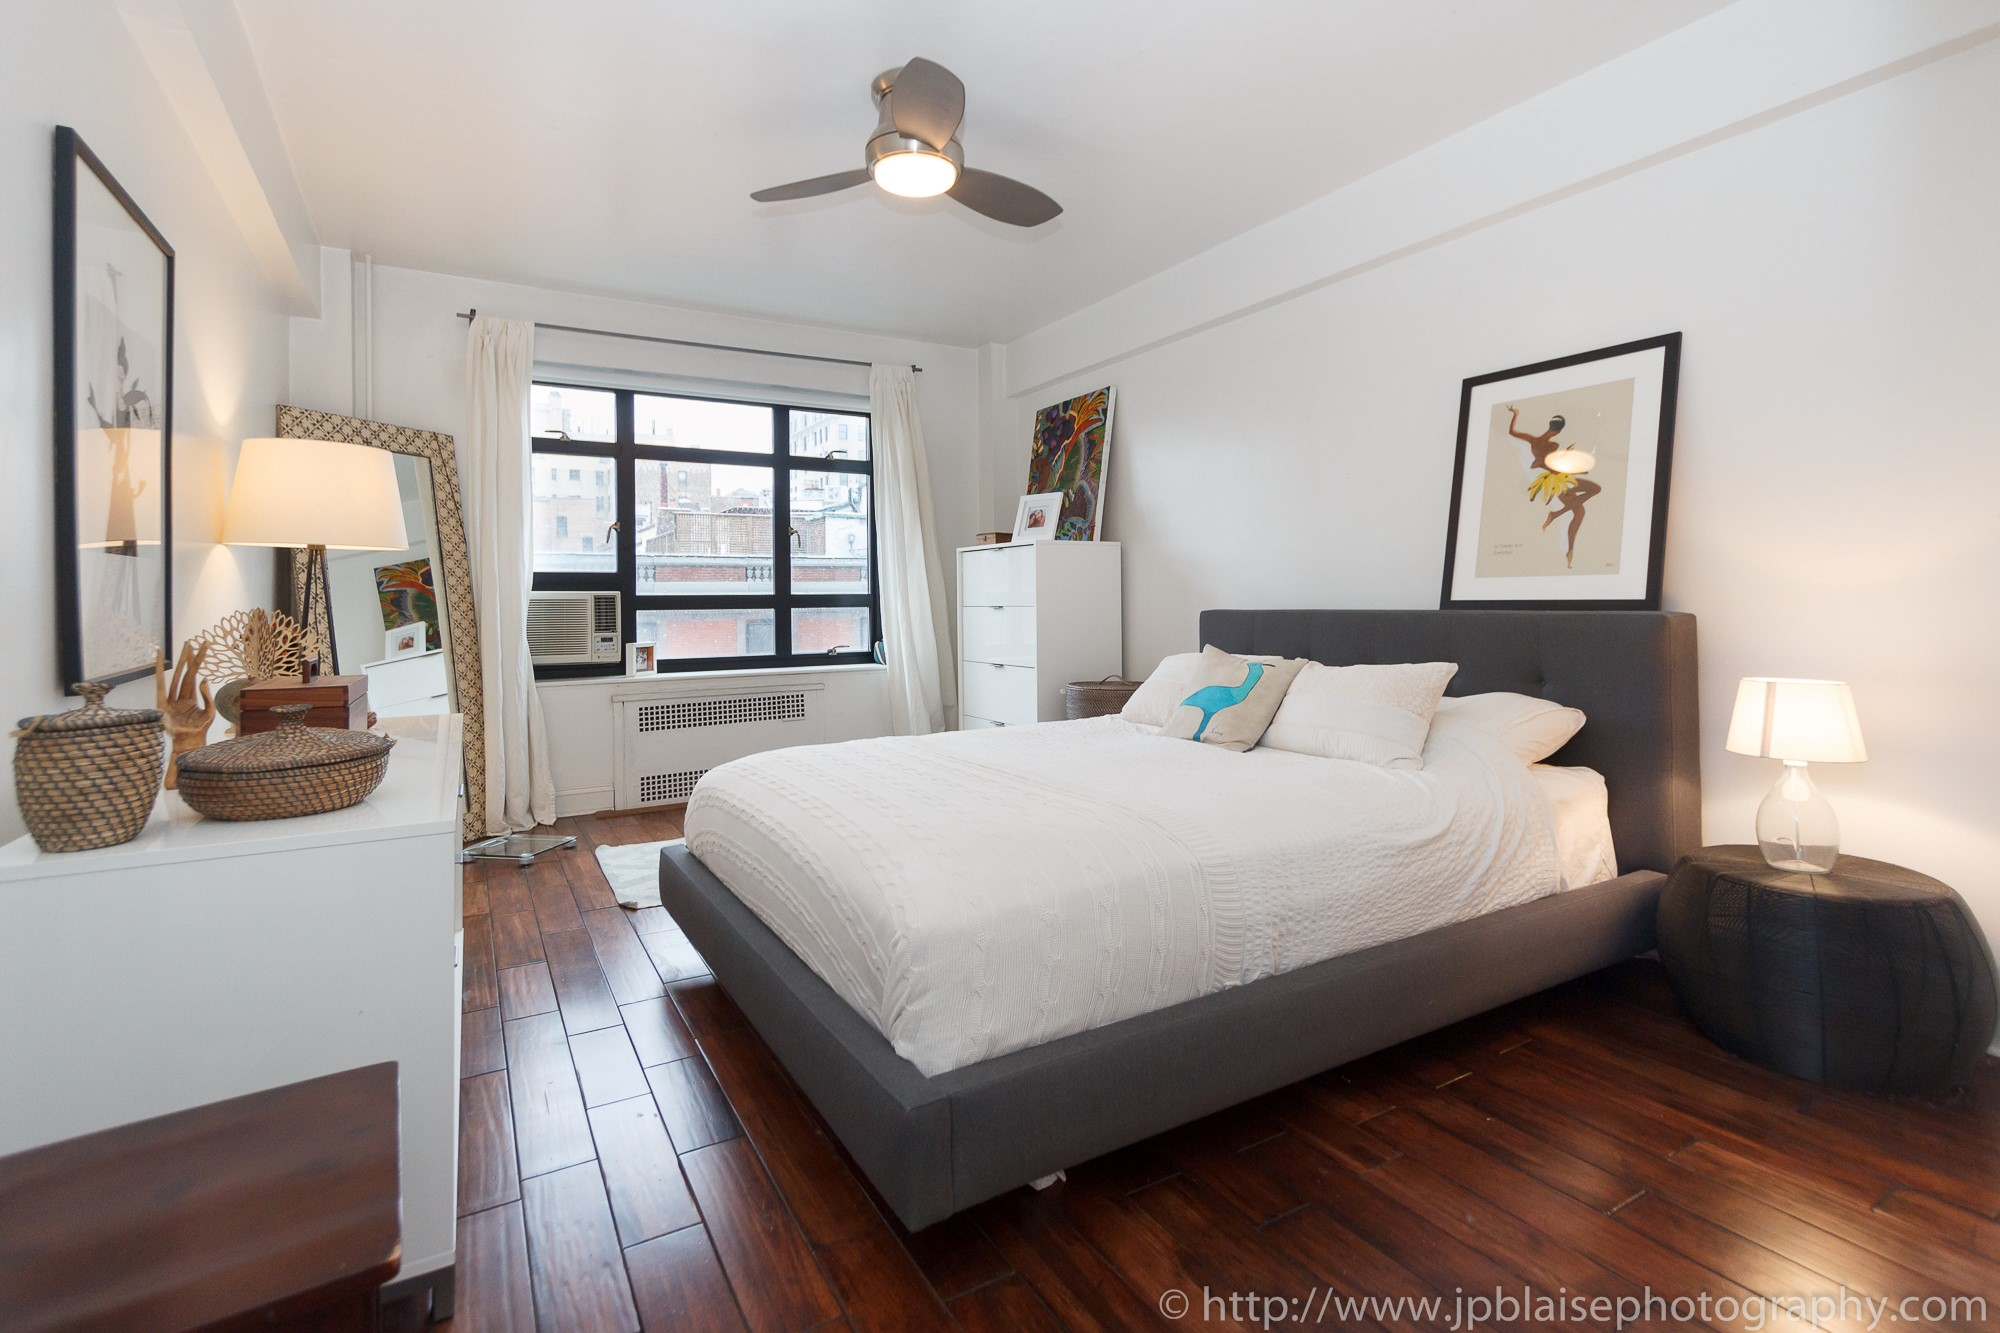 New york city apartment photographer work of the day one - One bedroom apartment in new york city ...